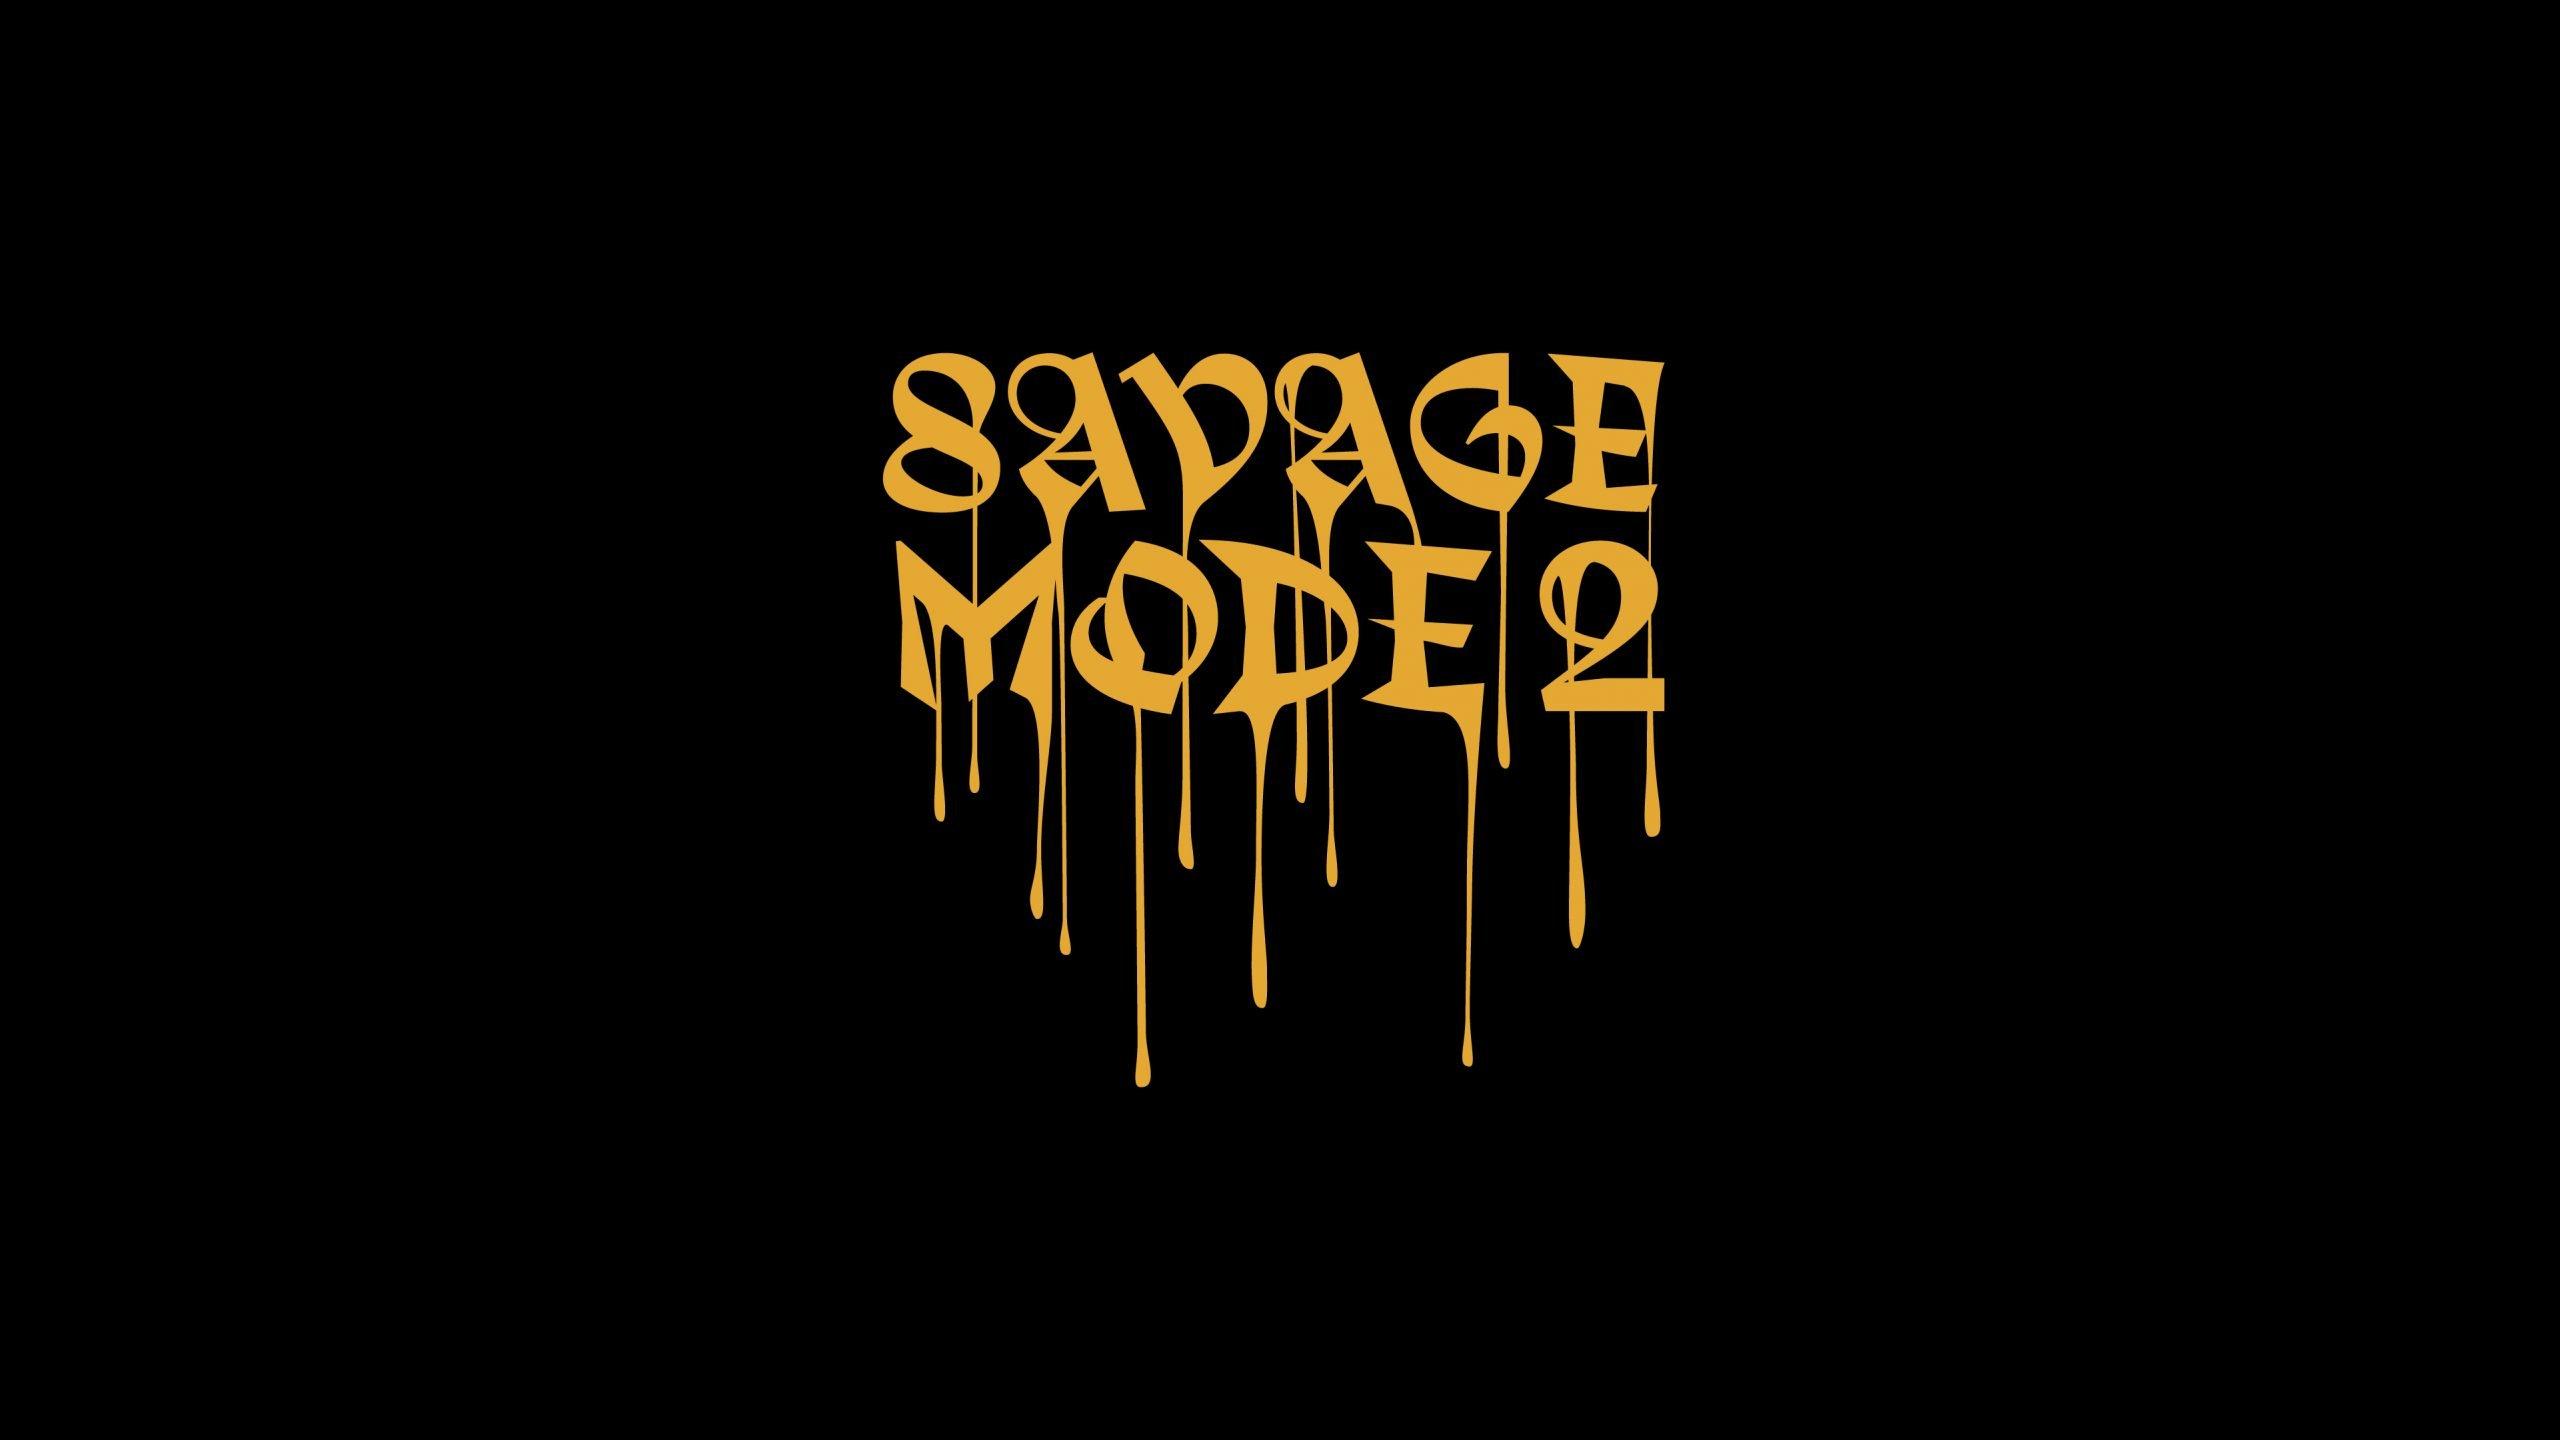 SAVAGE MODE II-merch-product 3 slider-02